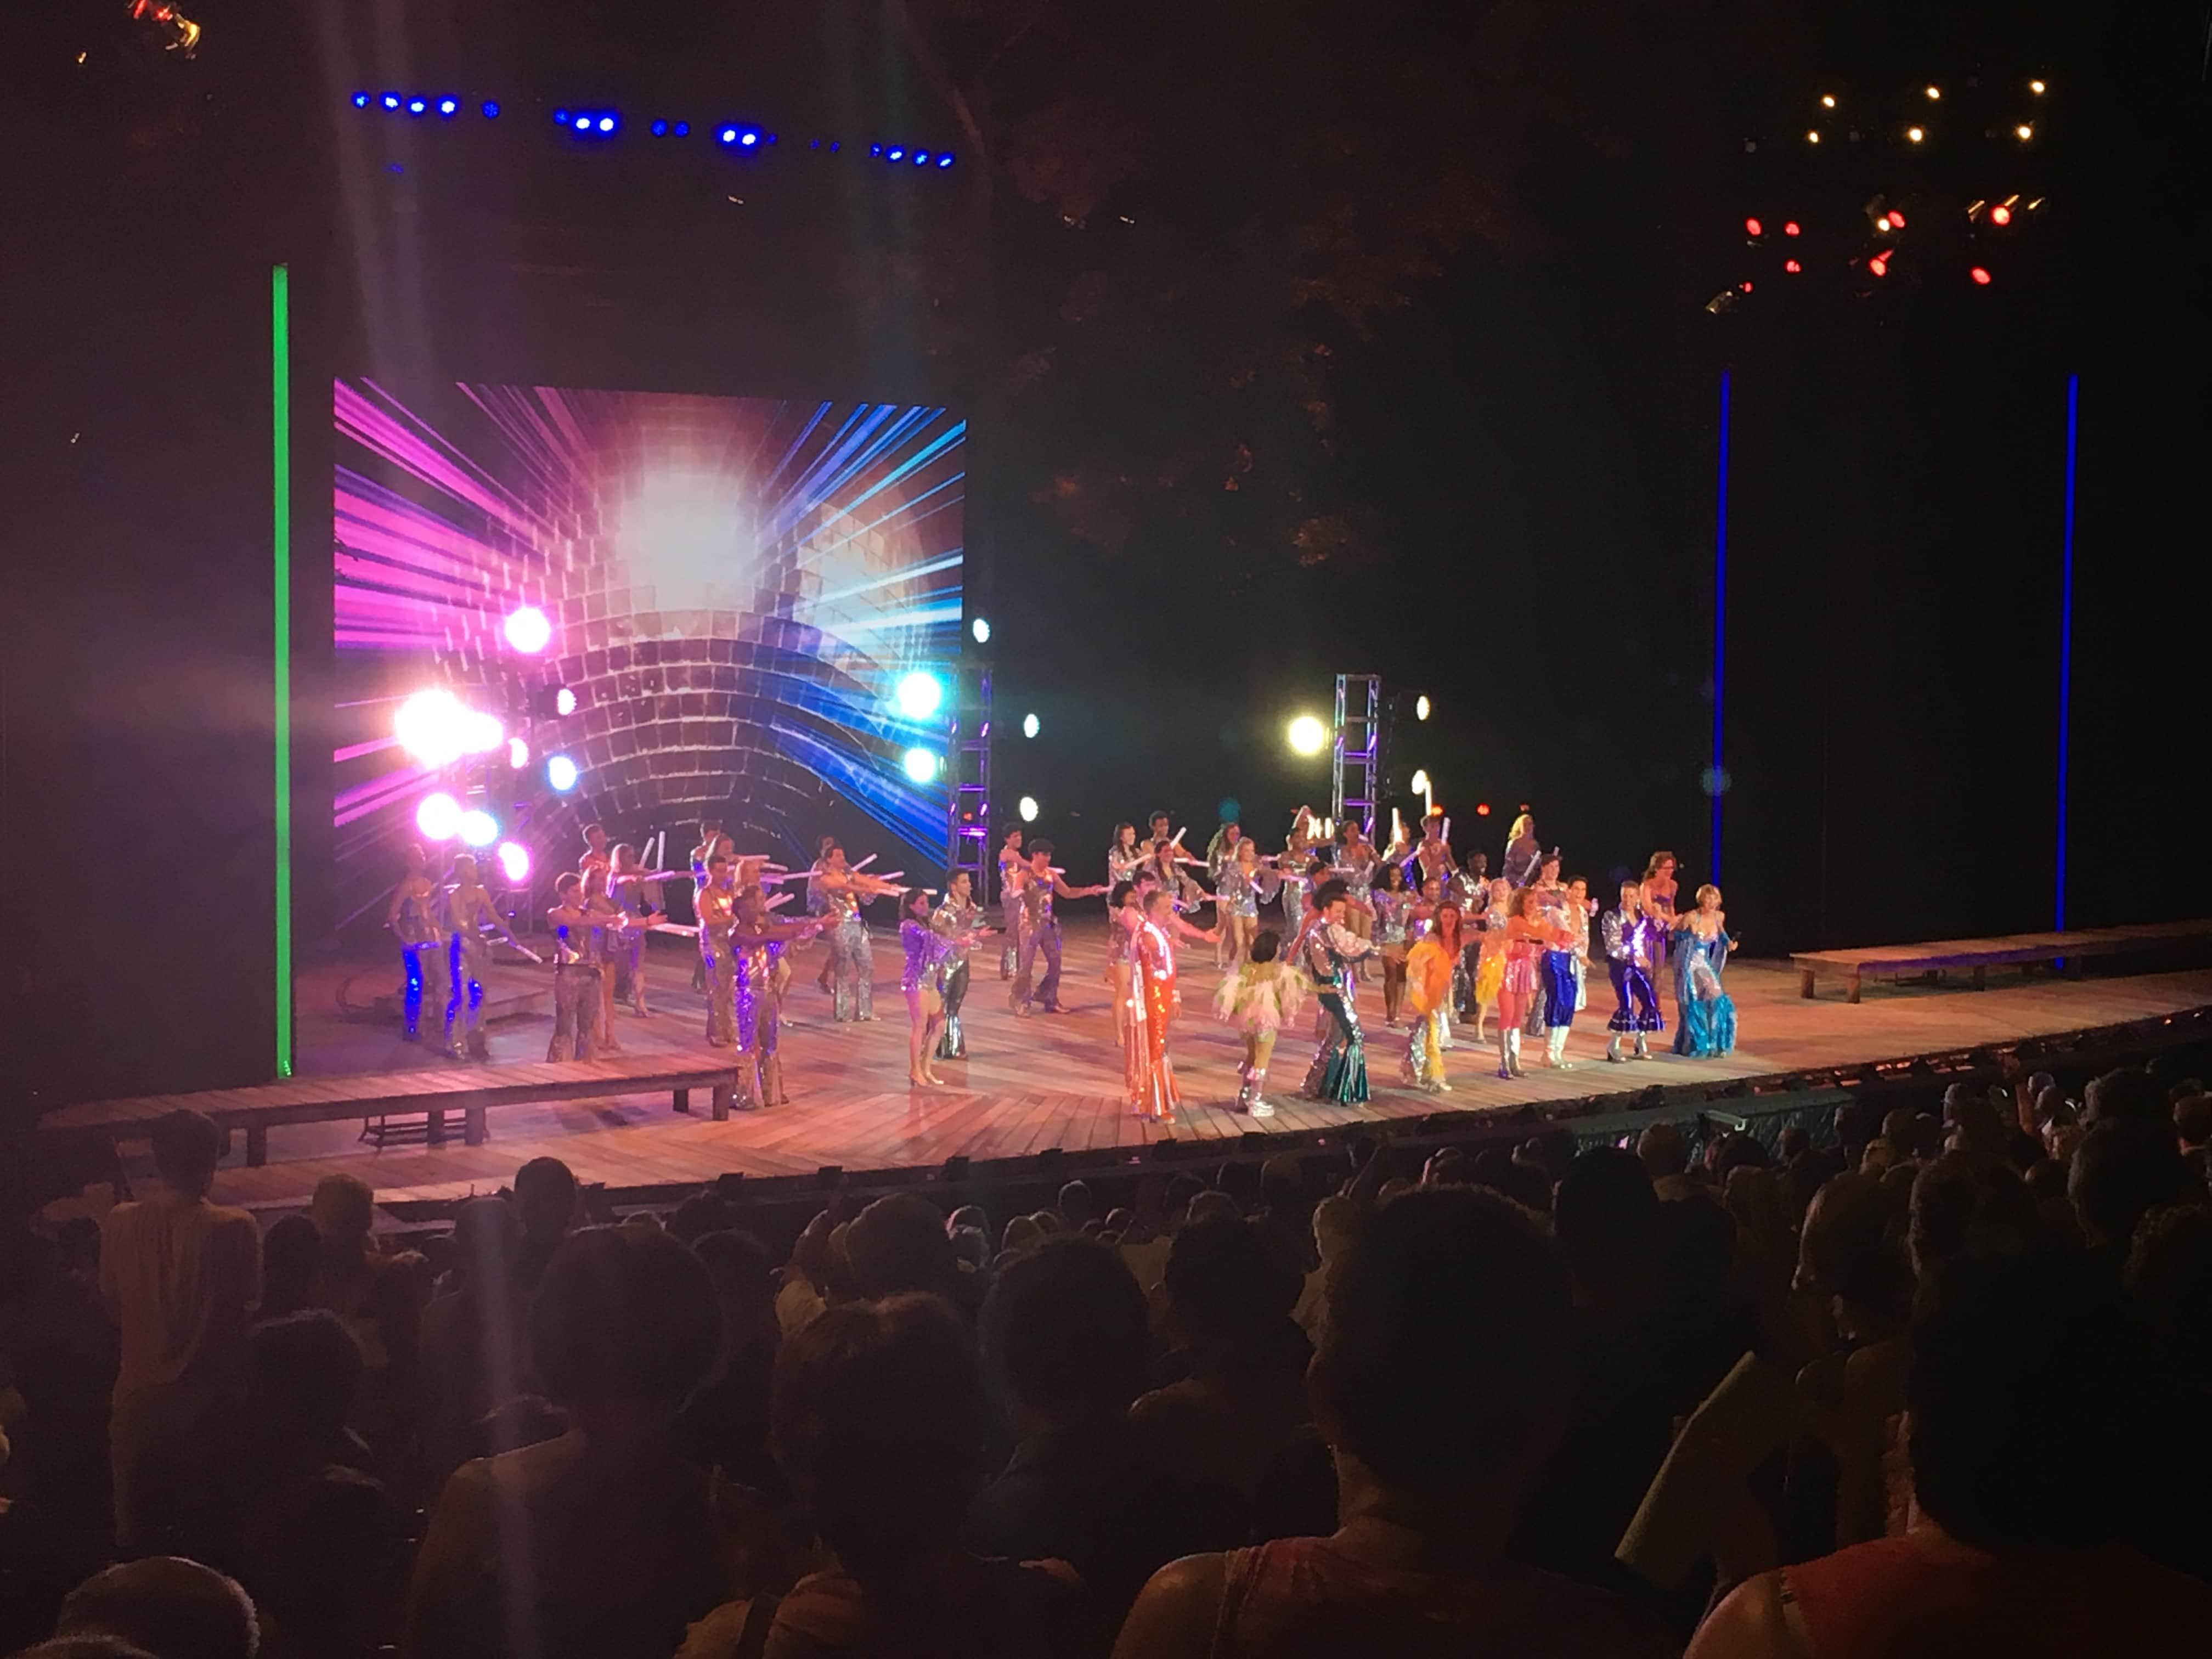 Meet Me at the Muny - Mamma Mia - Singalong - Show Ending